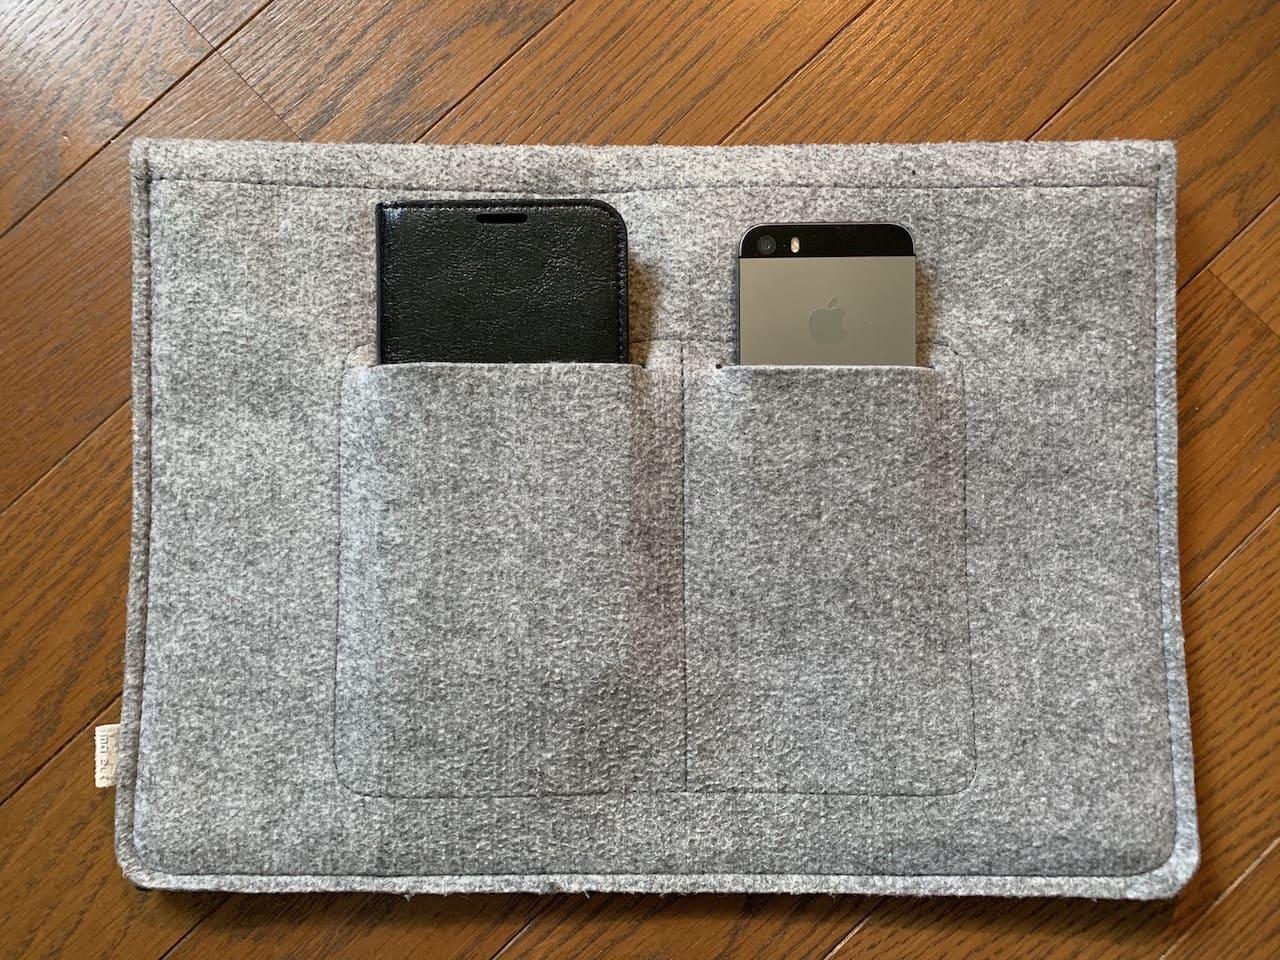 InateckのMacBookAir/Pro用ケース裏面のポケットサイズ①